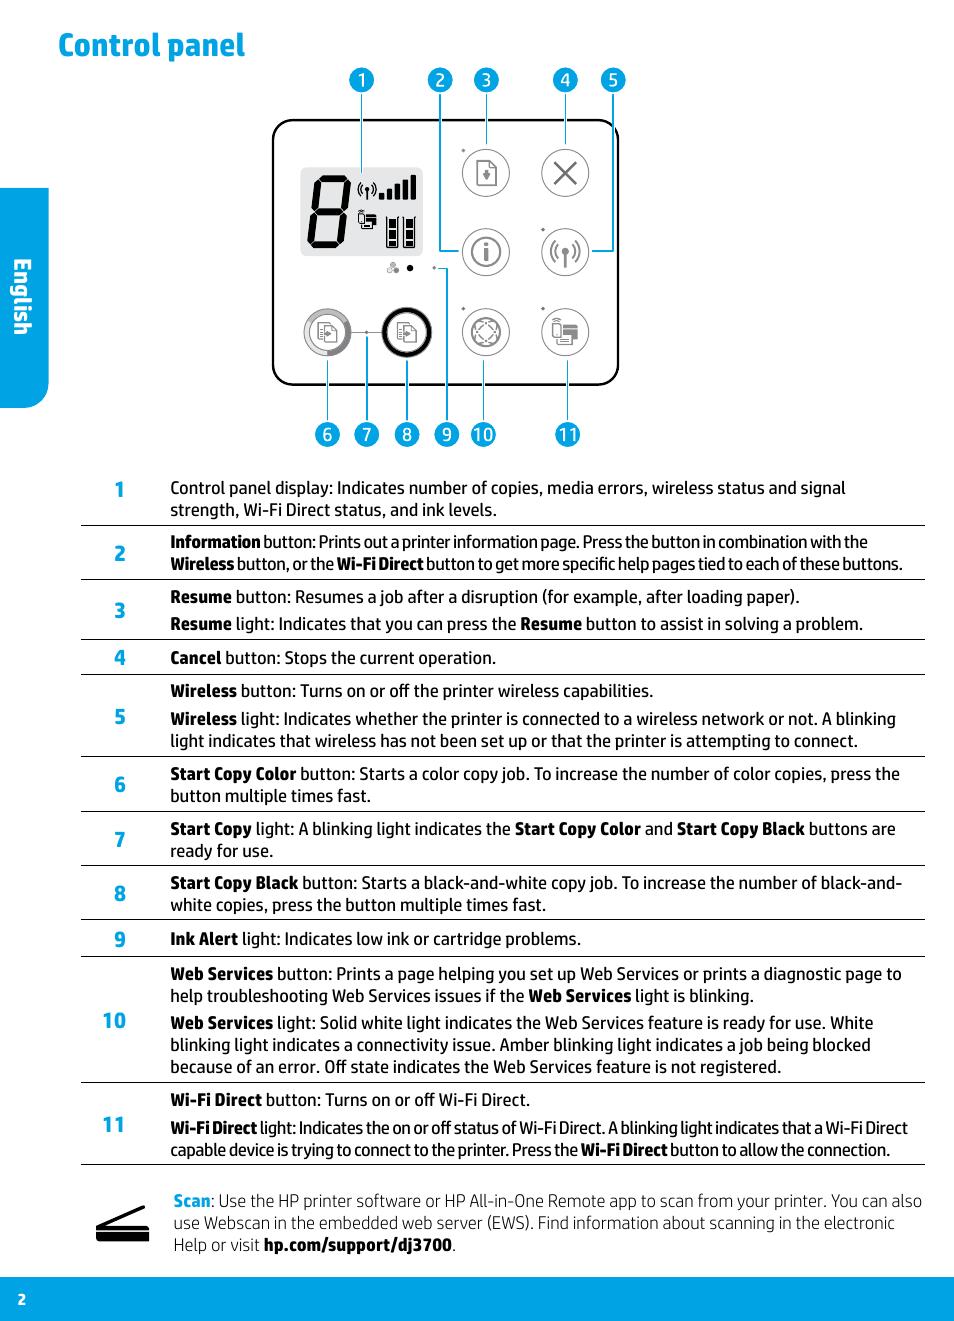 Control panel English  HP DeskJet 3700 User Manual  Page 2  19